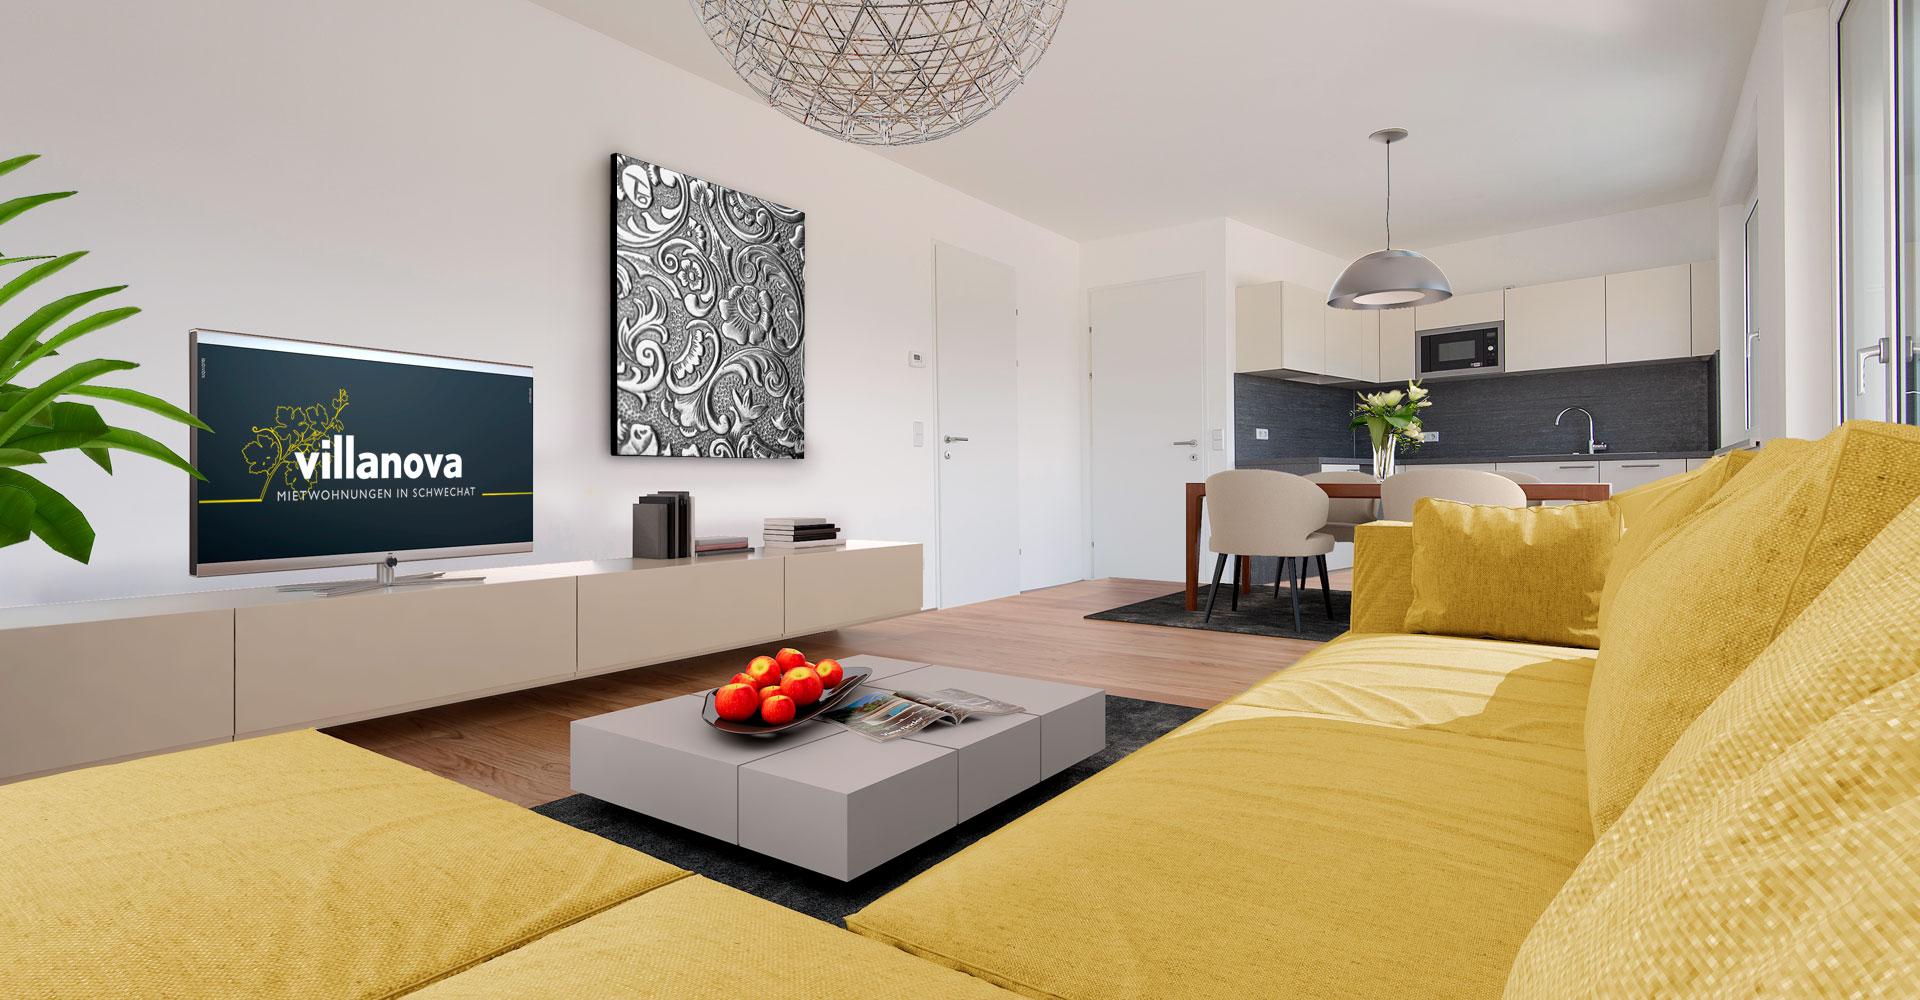 villanova - Wohnung mit Loggia / Balkon